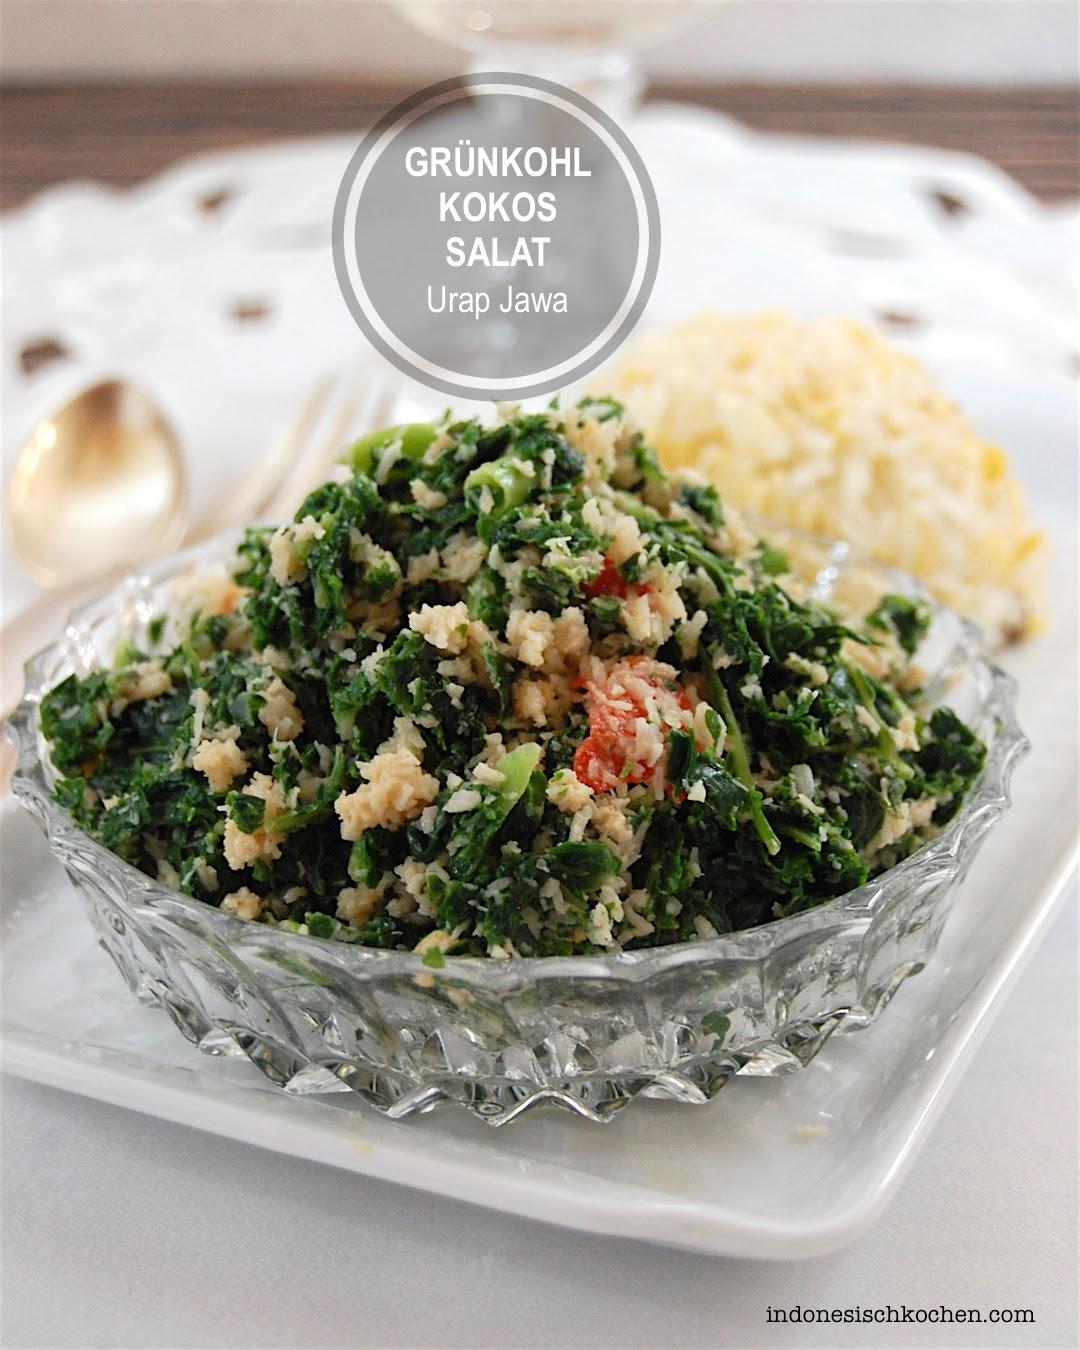 Grünkohl Kokos Salat mit Urap-urap Gewürz indonesisch kochen